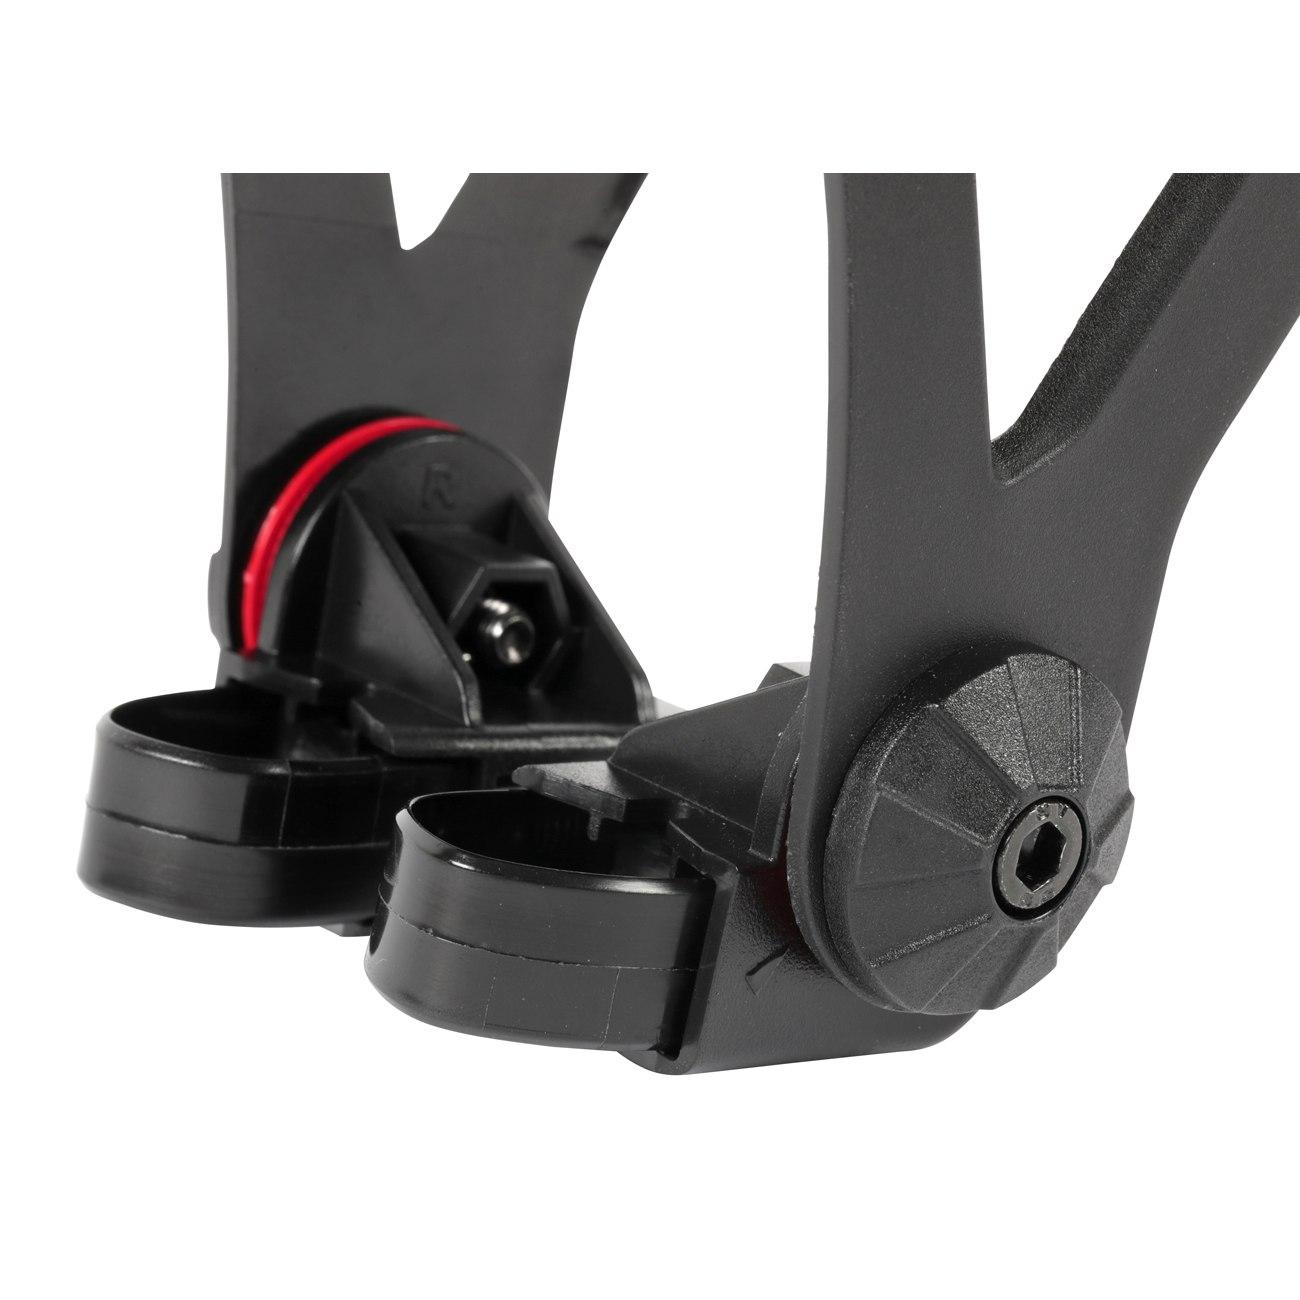 Image of Zéfal Deflector RS75 Mudguard - black